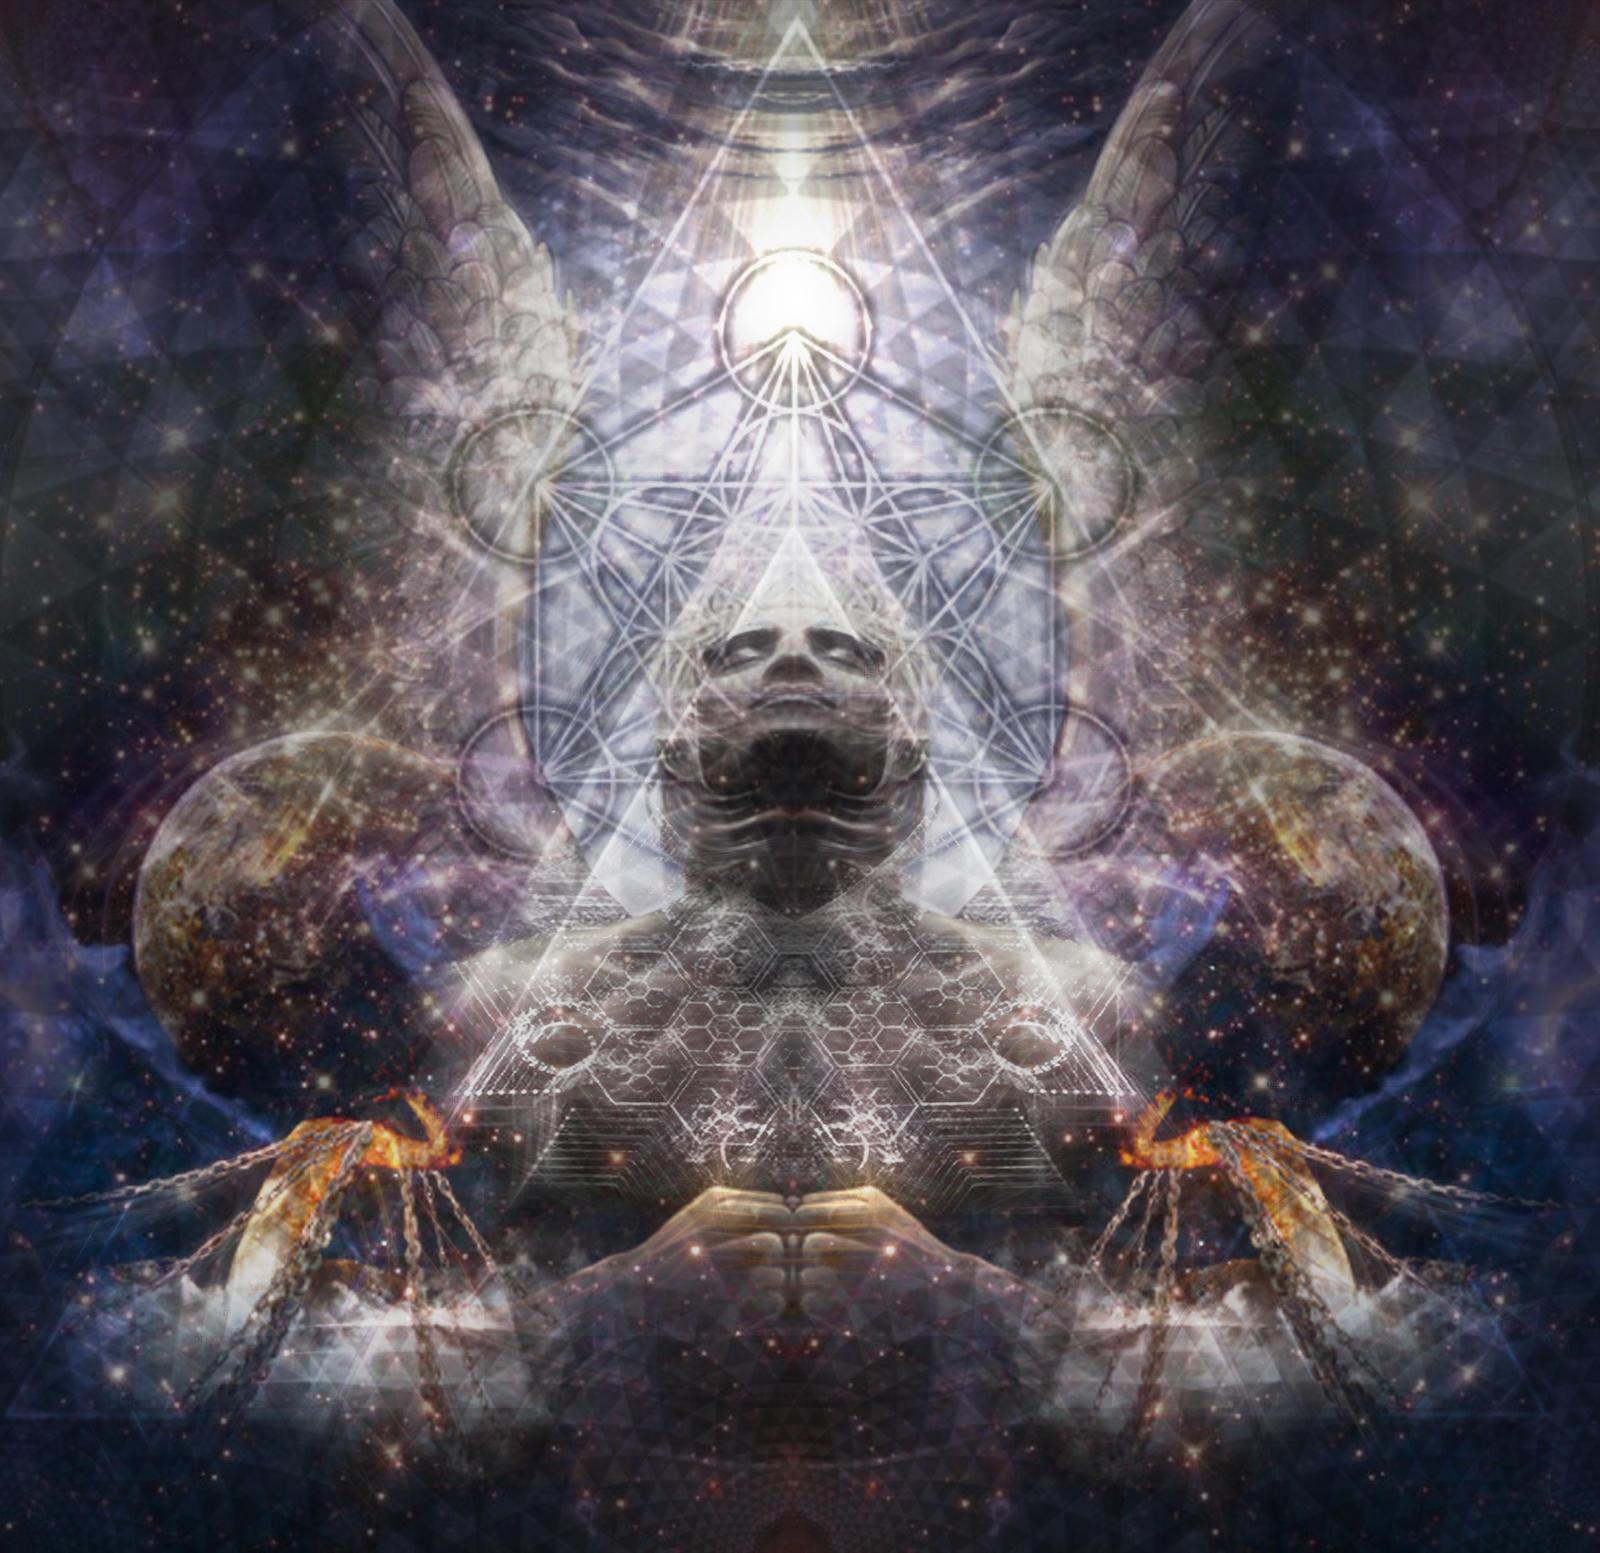 Interstellar Overdrive by metatroncoppolacid